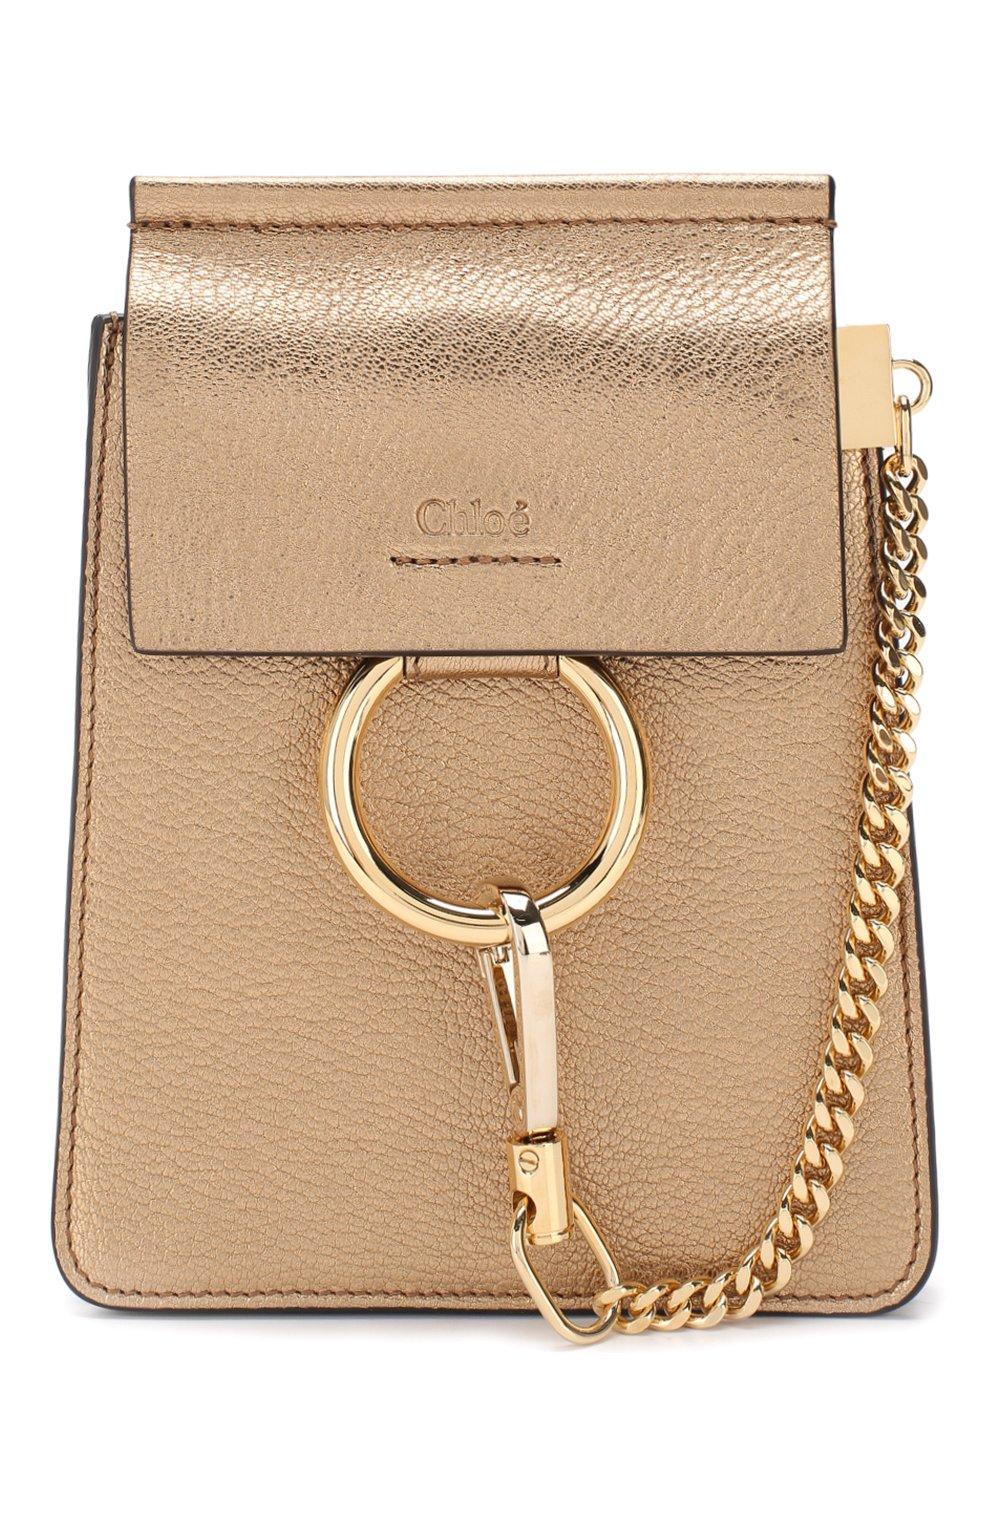 Сумка Faye small Bracelet Chloé золотая цвета | Фото №7